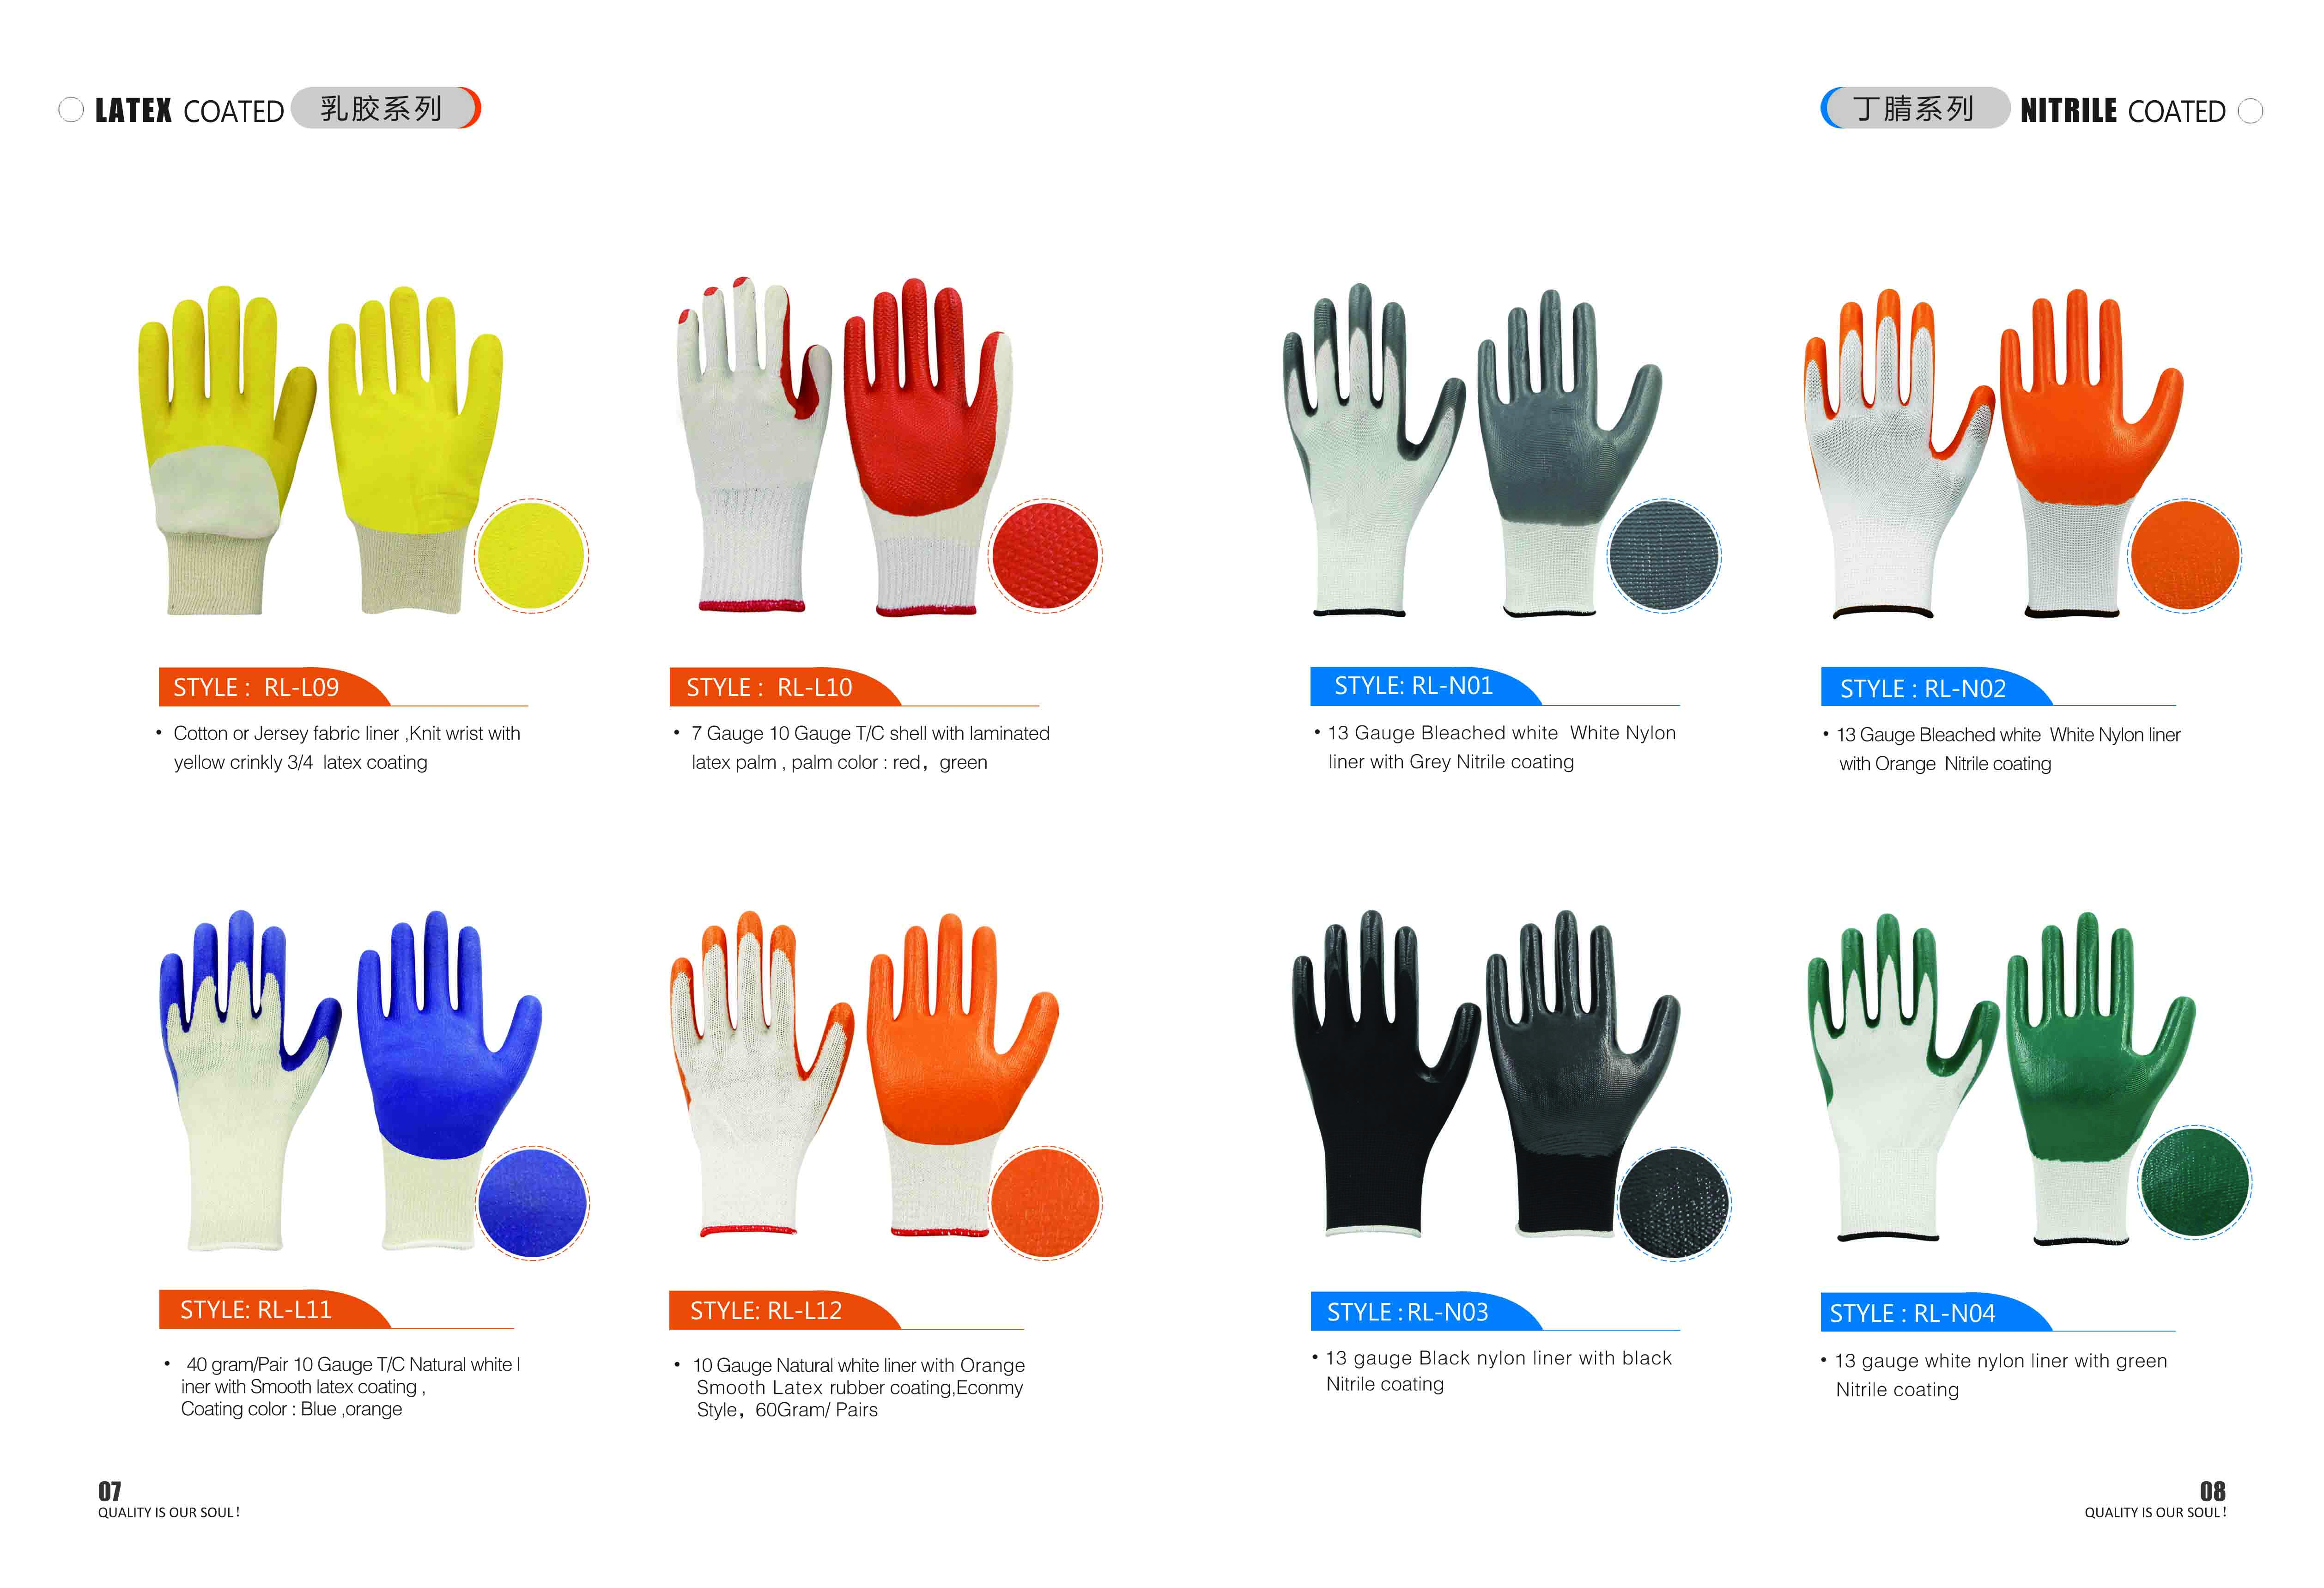 10G Polyester Latex Coated Handjob Labor Glove - Buy Polyester Latex Coated Handjob -2853